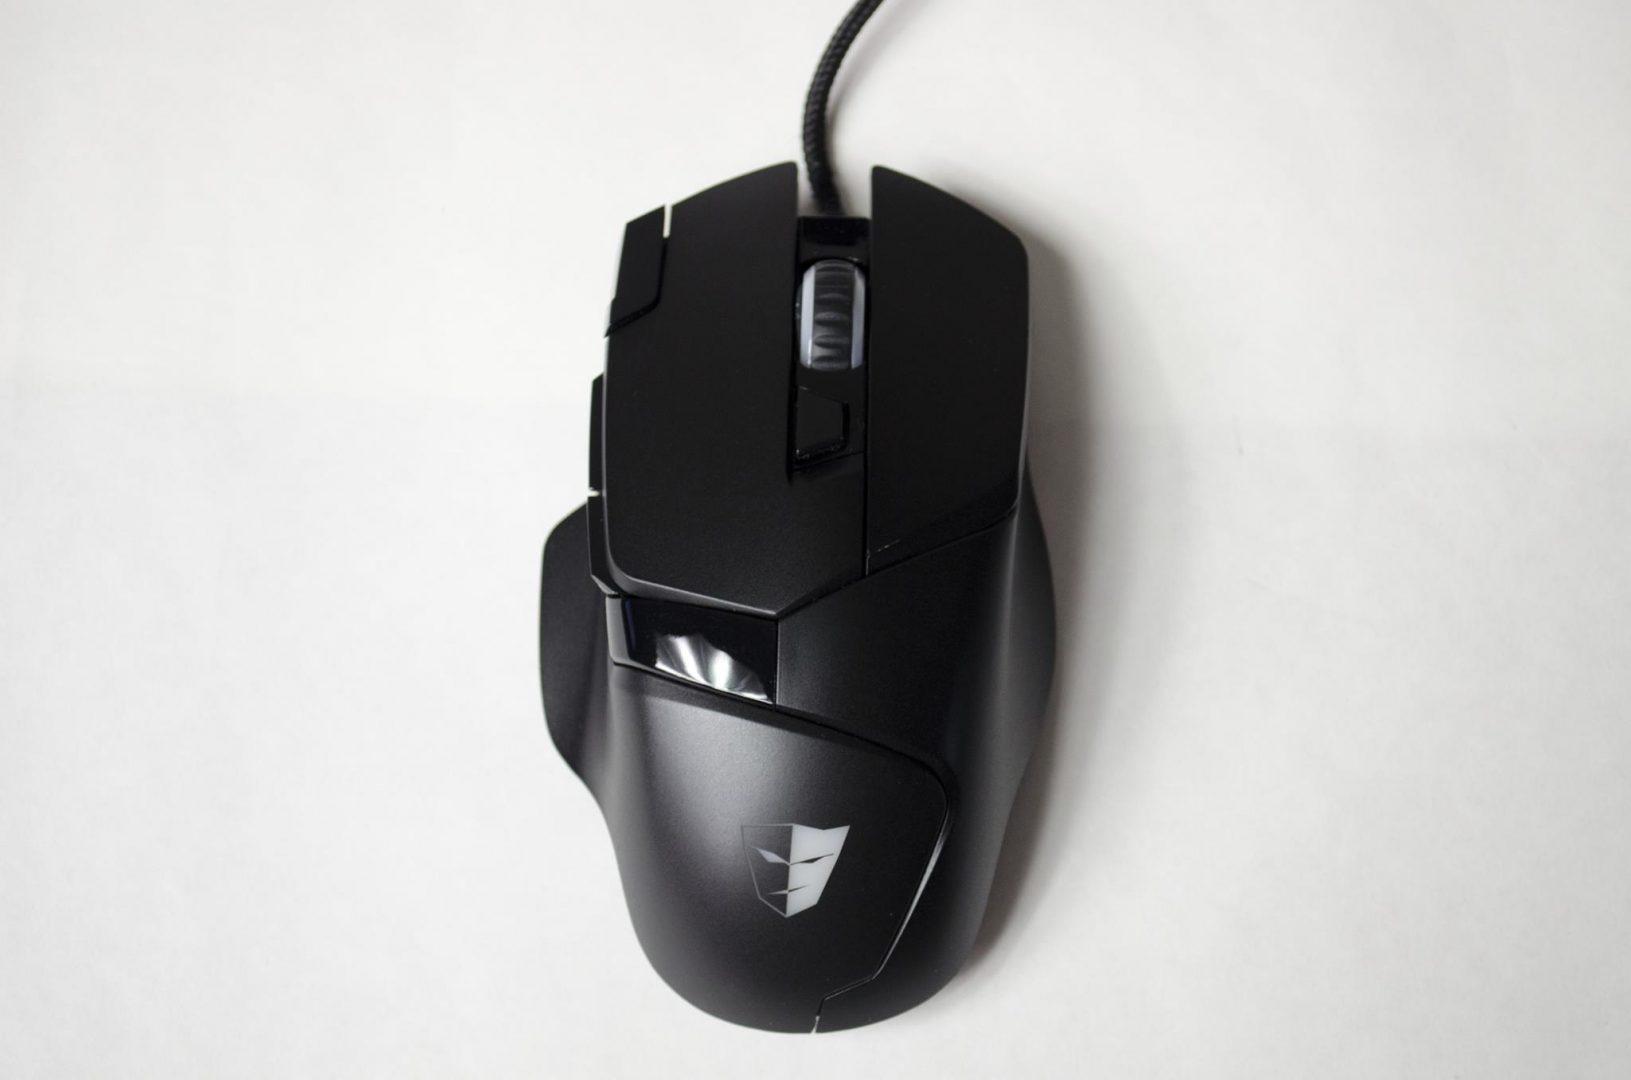 tesoro ascalon spectrum rgb gaming mouse_9